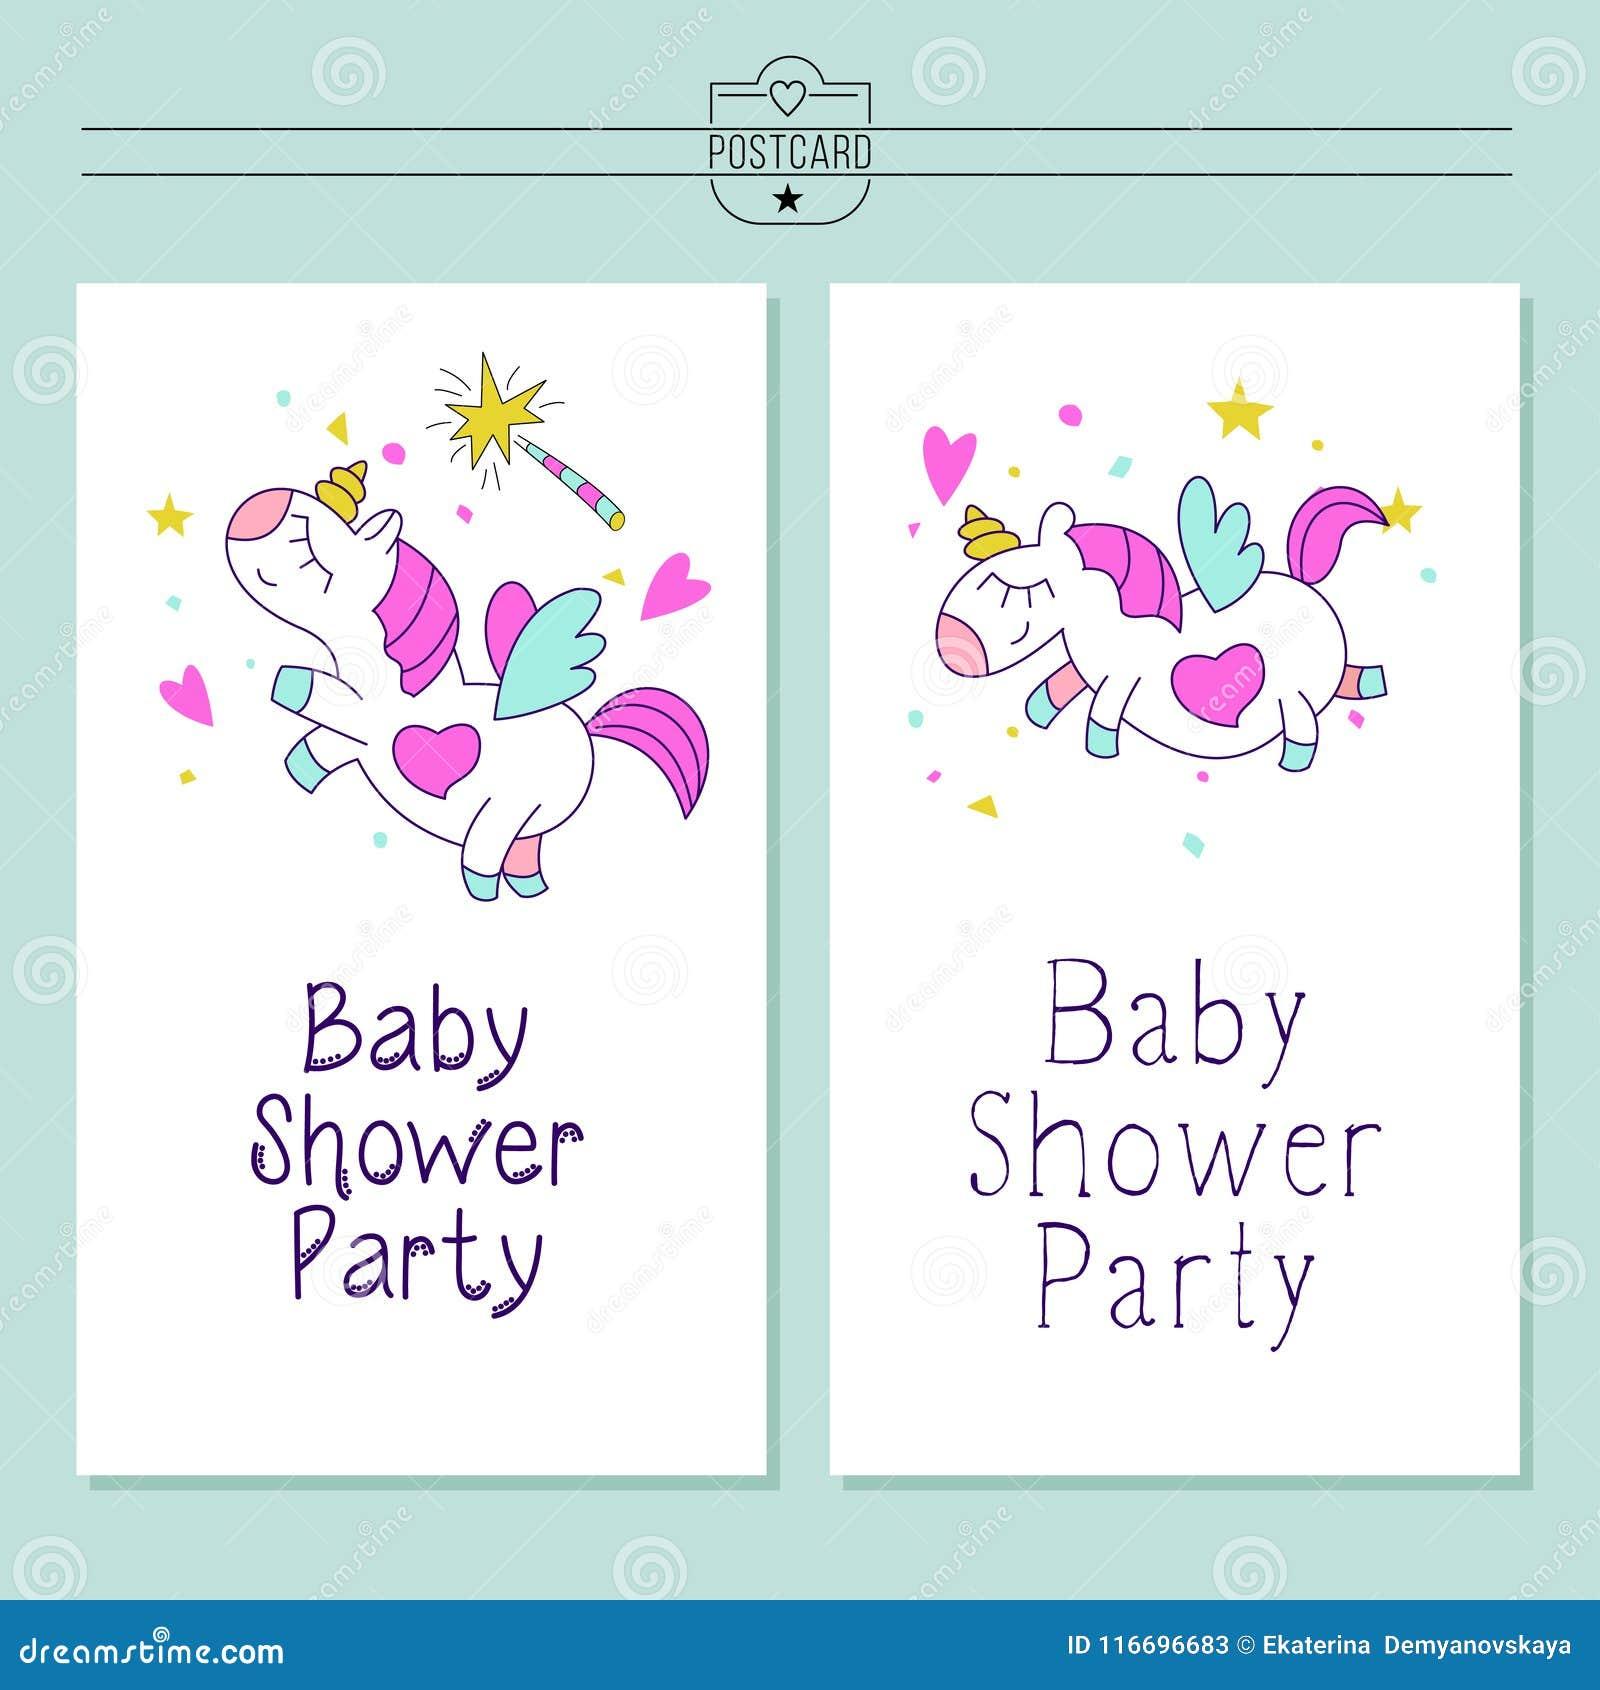 Unicorns Baby Shower Illustration Little Cute Unicorns With Wings